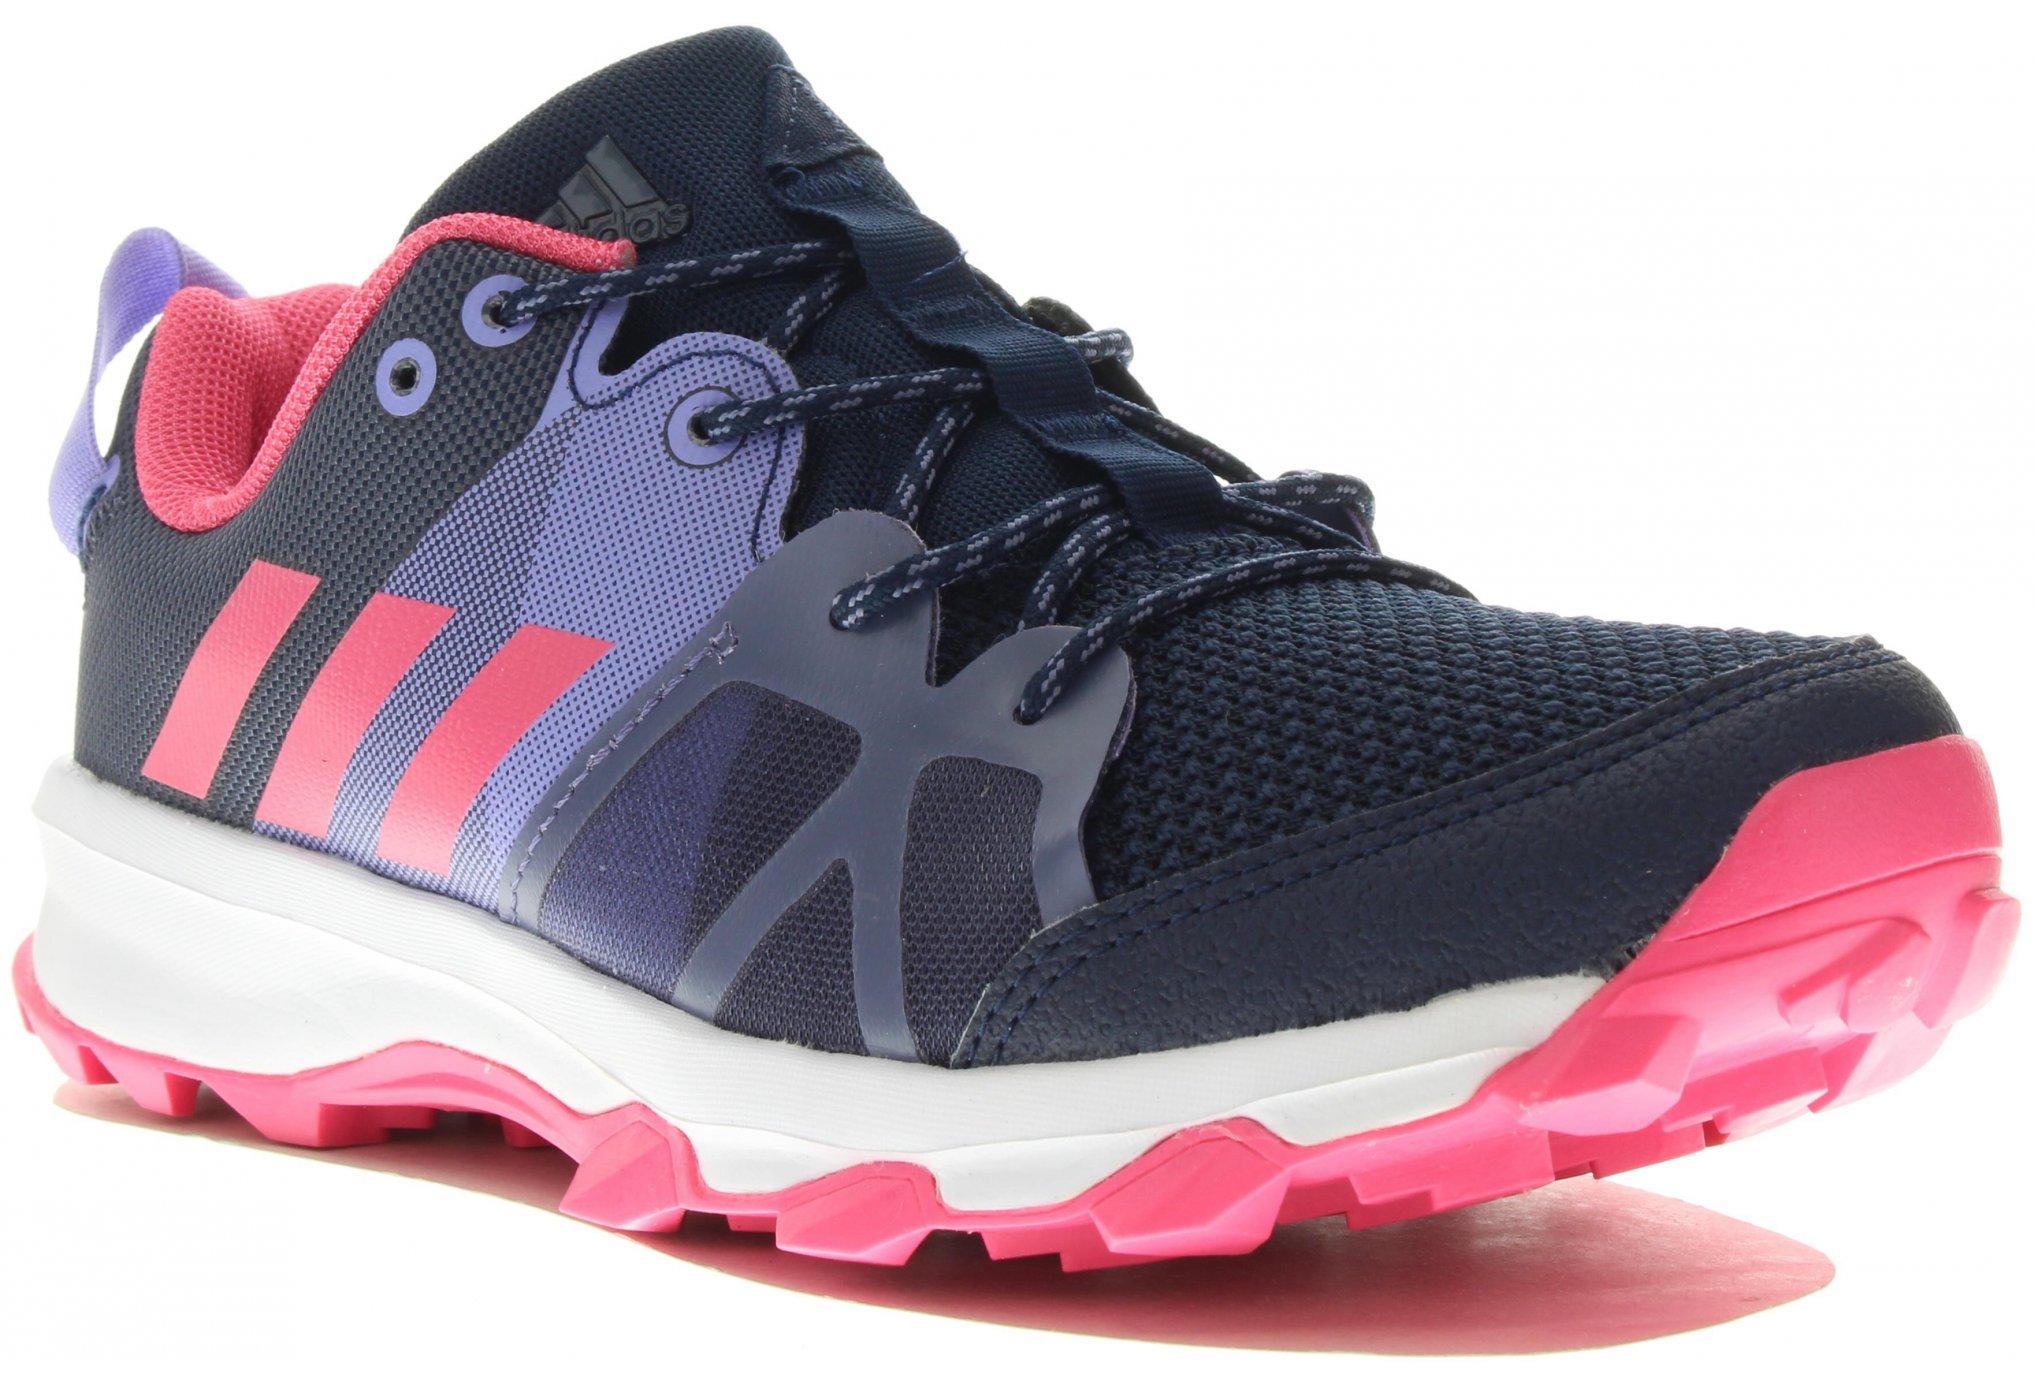 adidas Kanadia 8.1 Junior Chaussures running femme